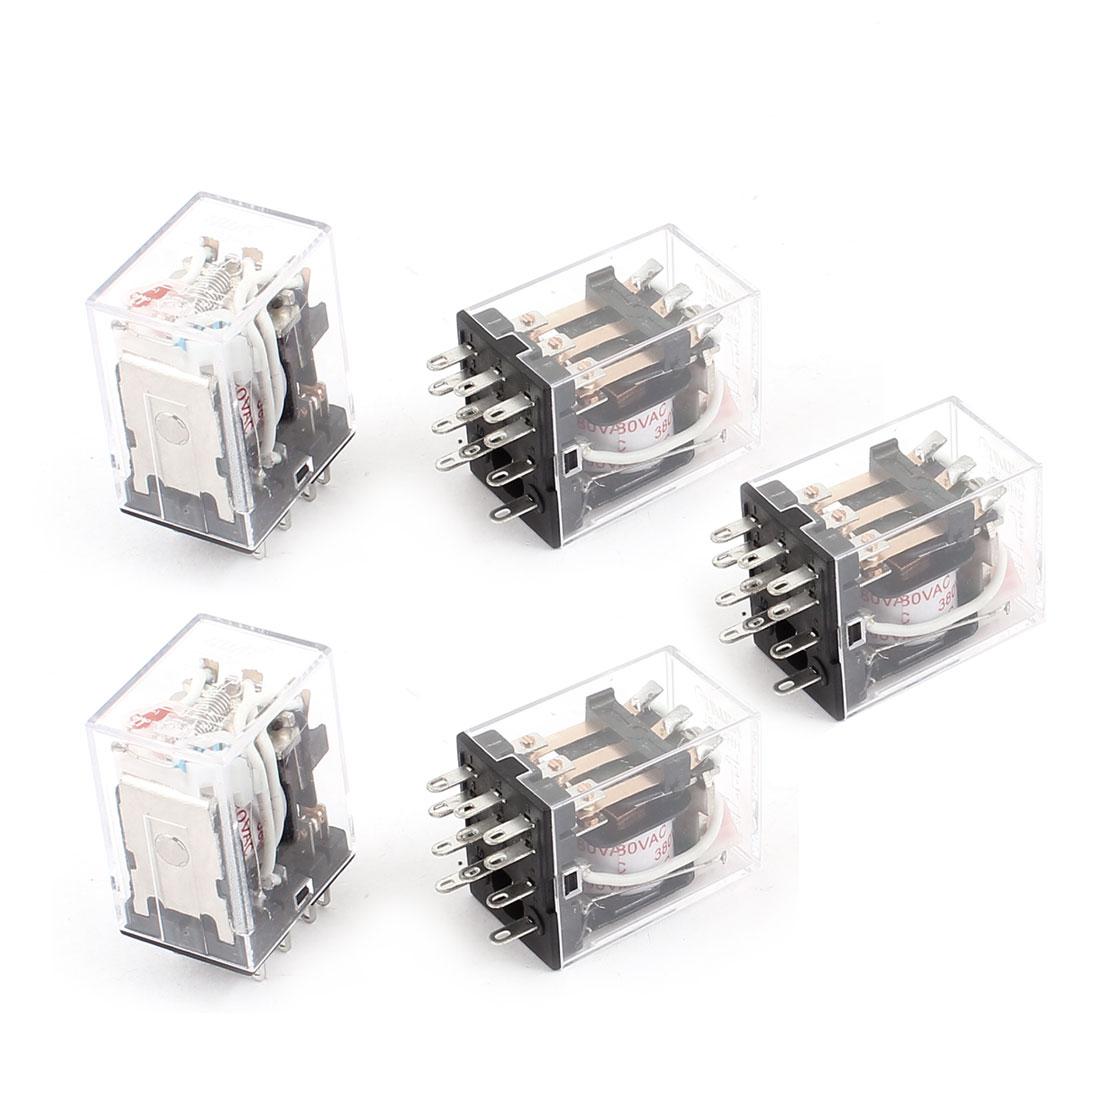 HH53PL AC 380V Coil 11-Pin 3PDT Red LED Light Electromagnetic Relay 5 Pcs